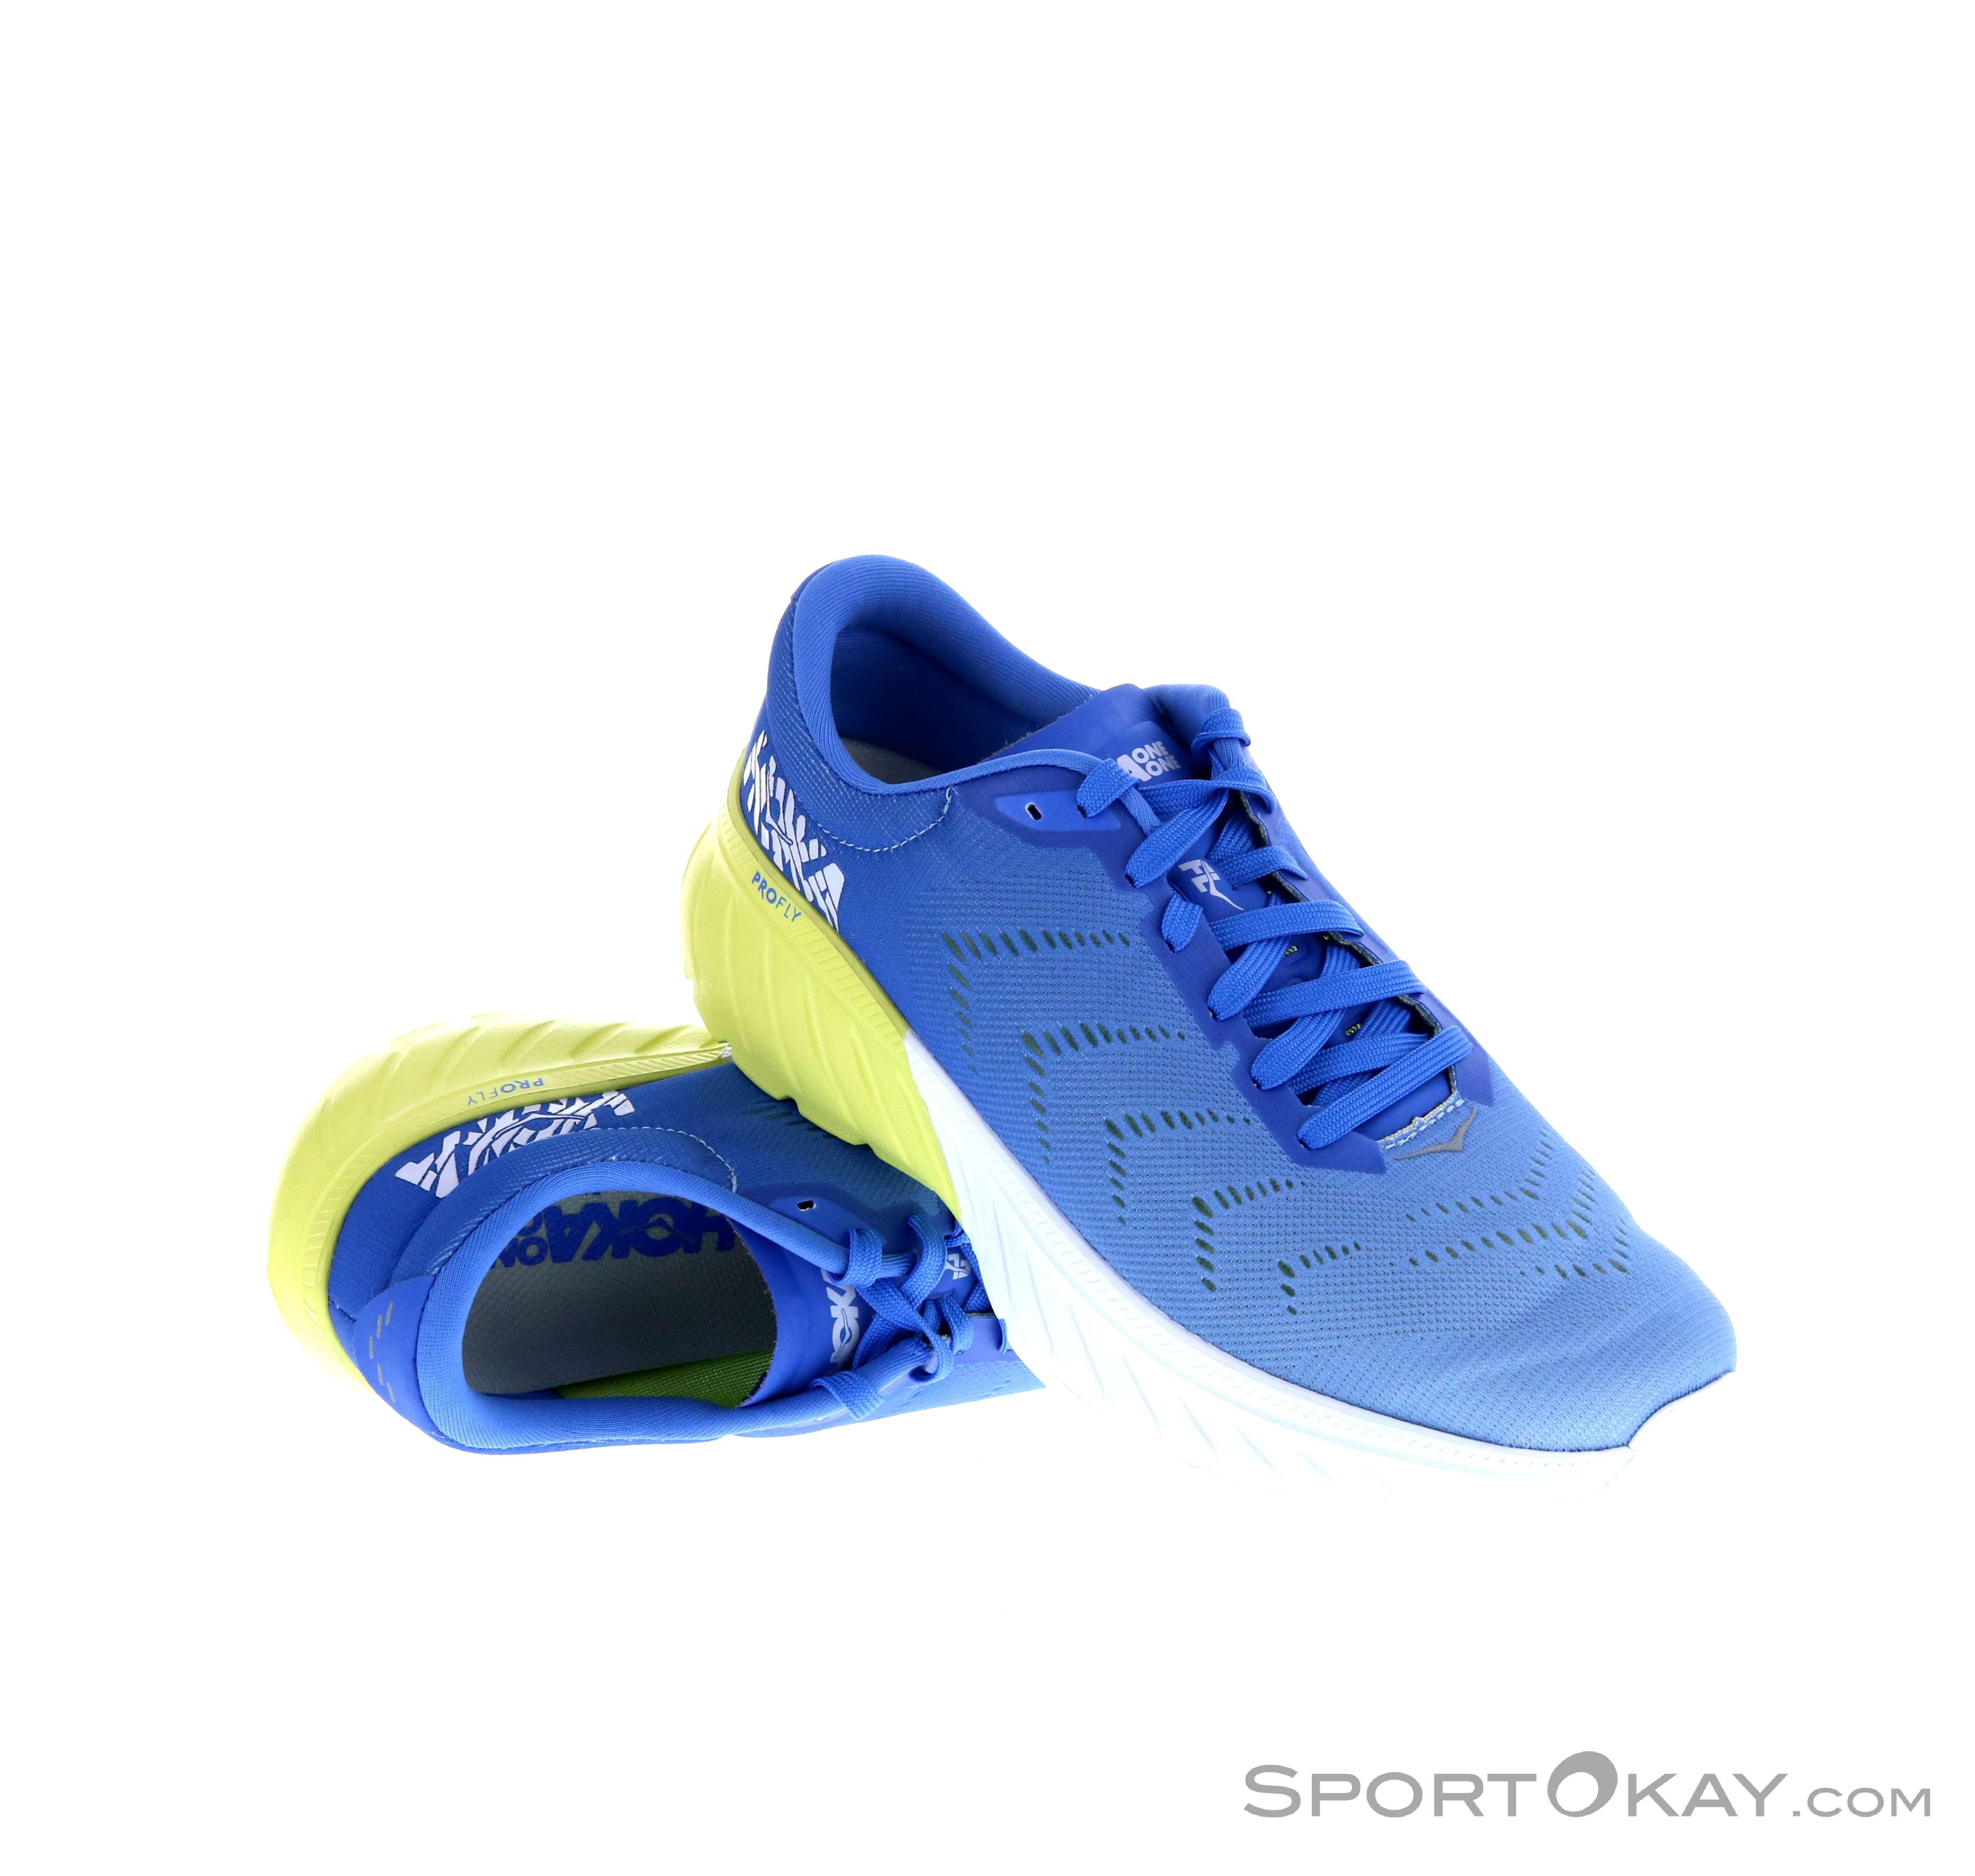 the best attitude 55c98 c8094 Hoka One One Hoka One One Mach 2 Womens Running Shoes